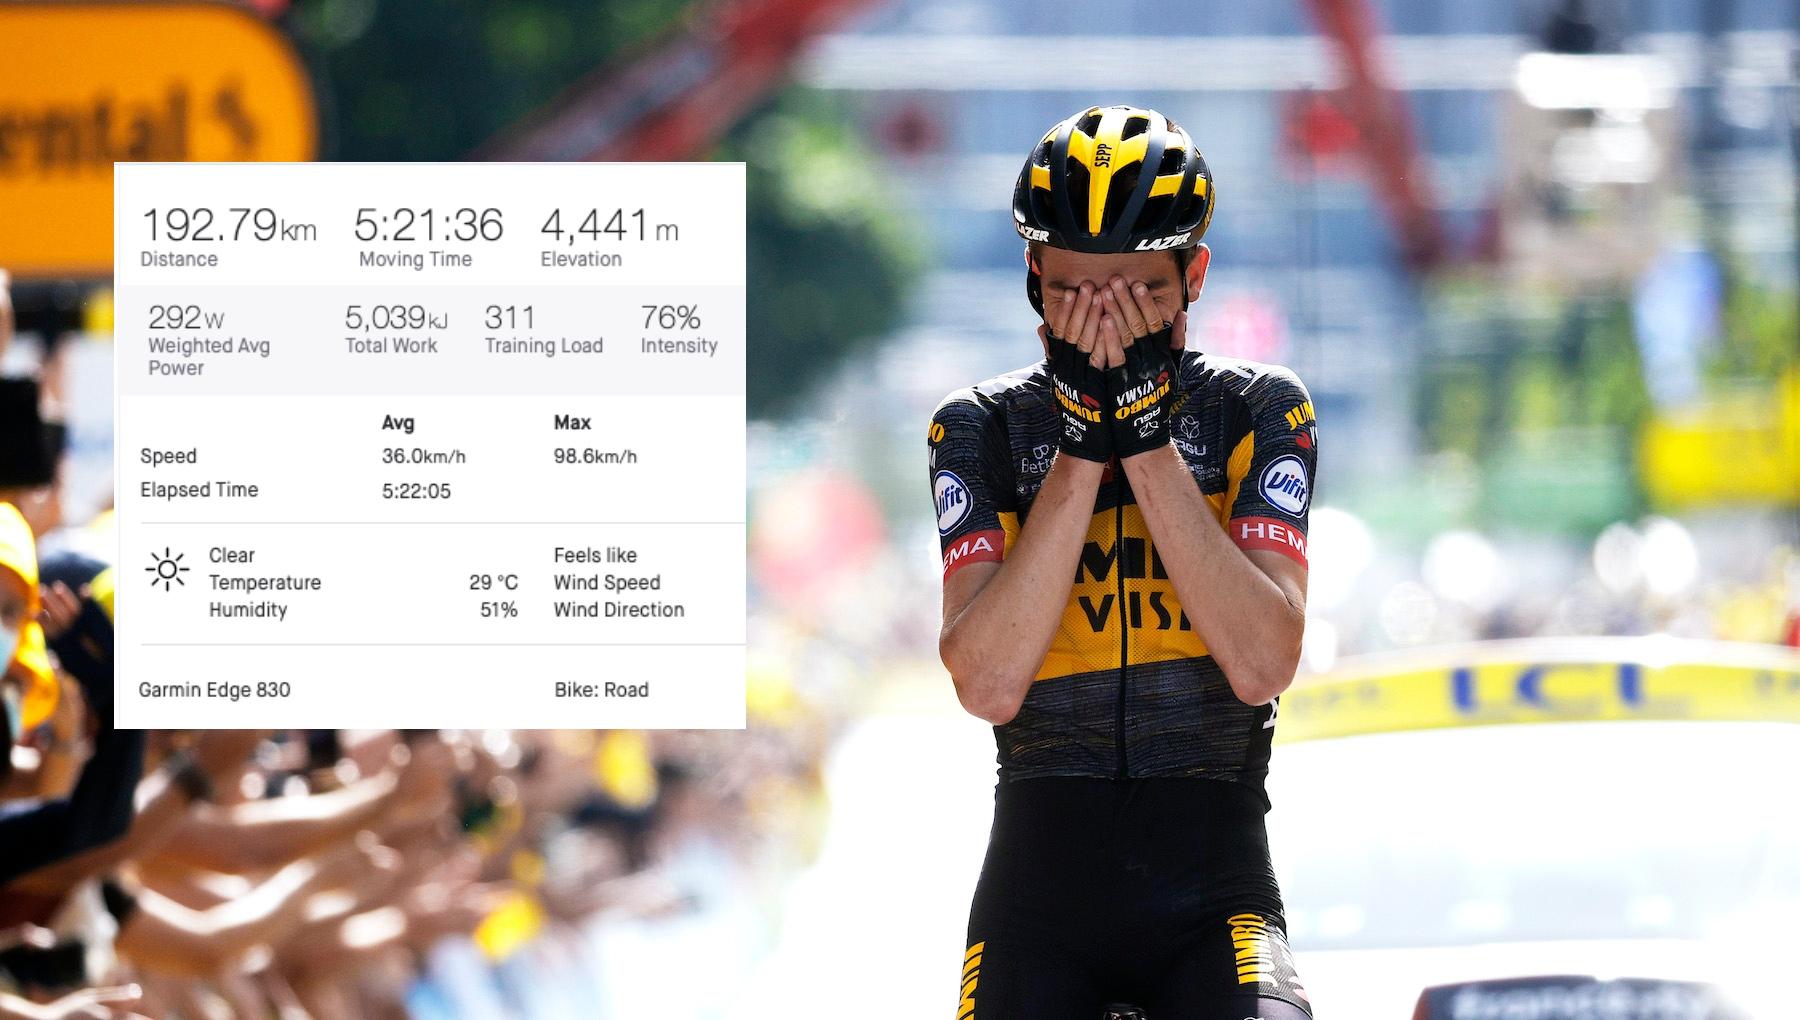 Sepp Kuss wins stage 15 of the Tour de France